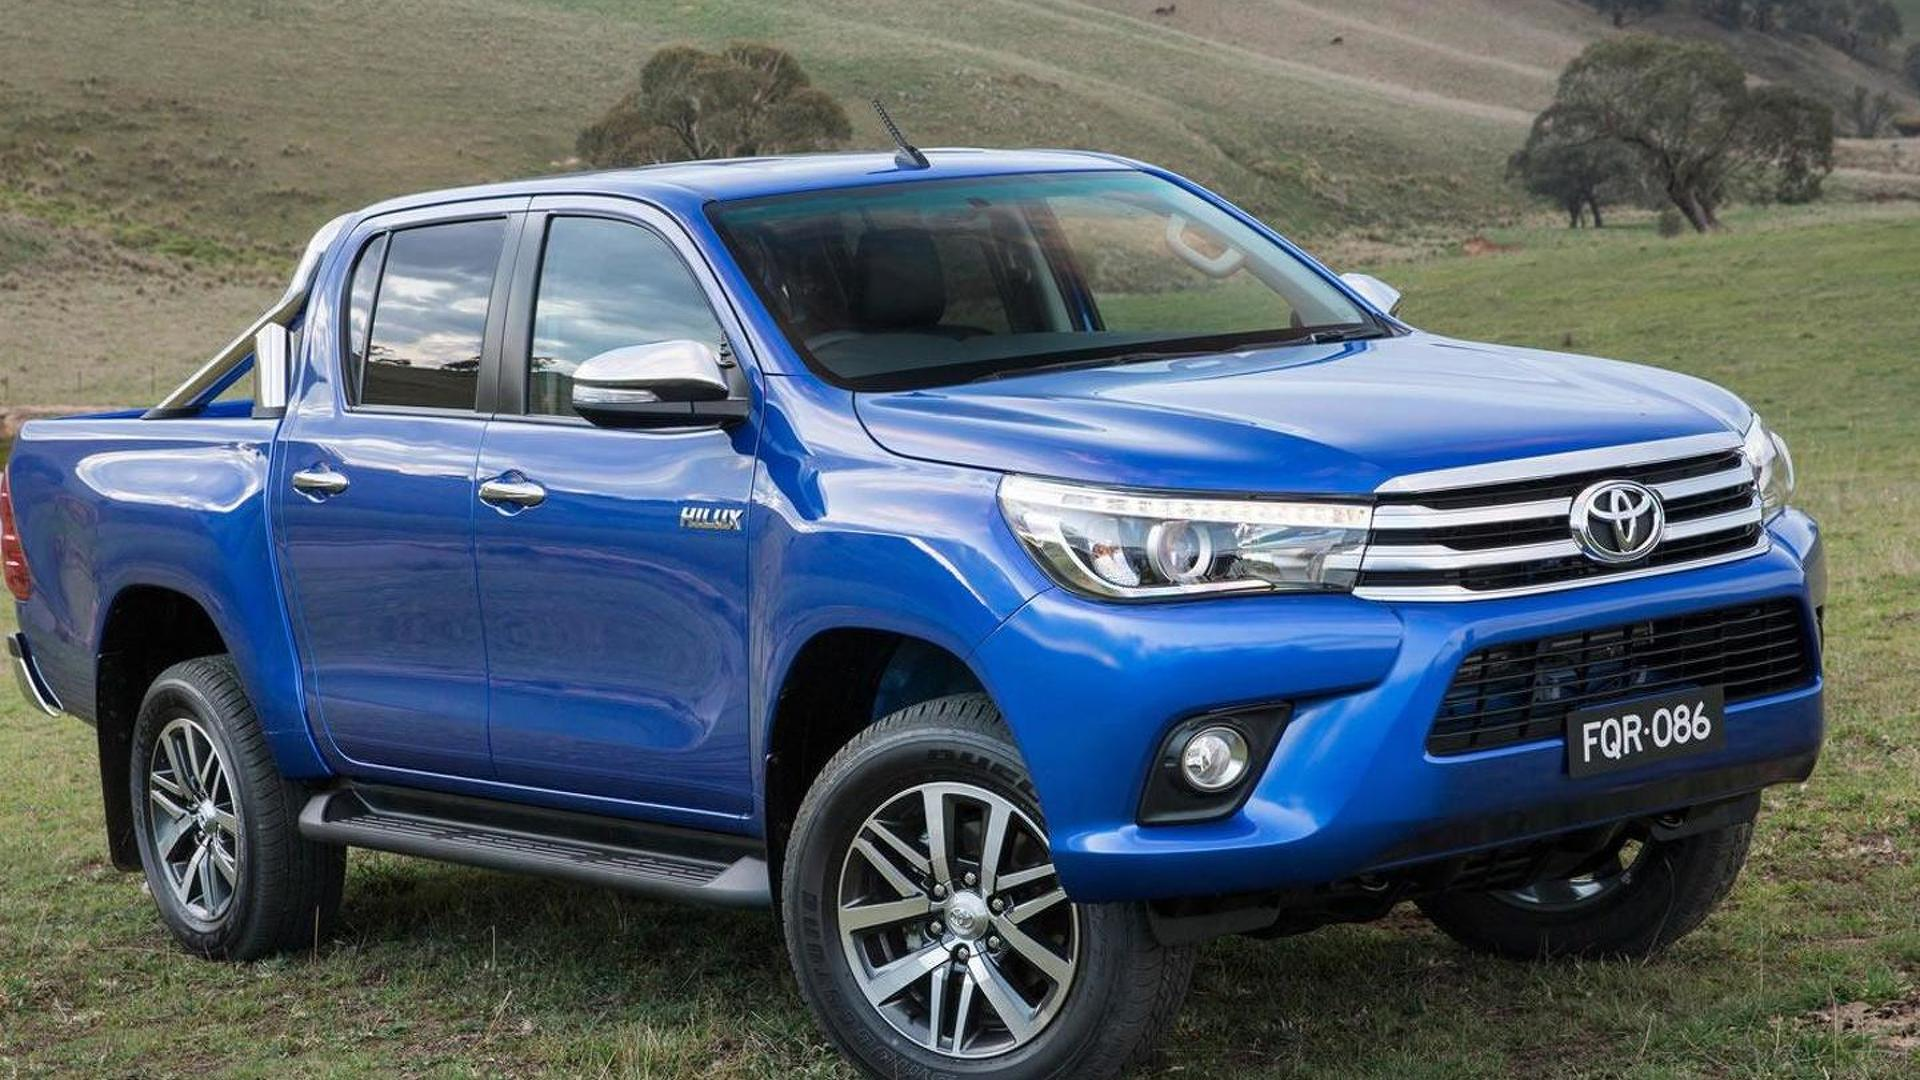 Kelebihan Harga Toyota Hilux Harga